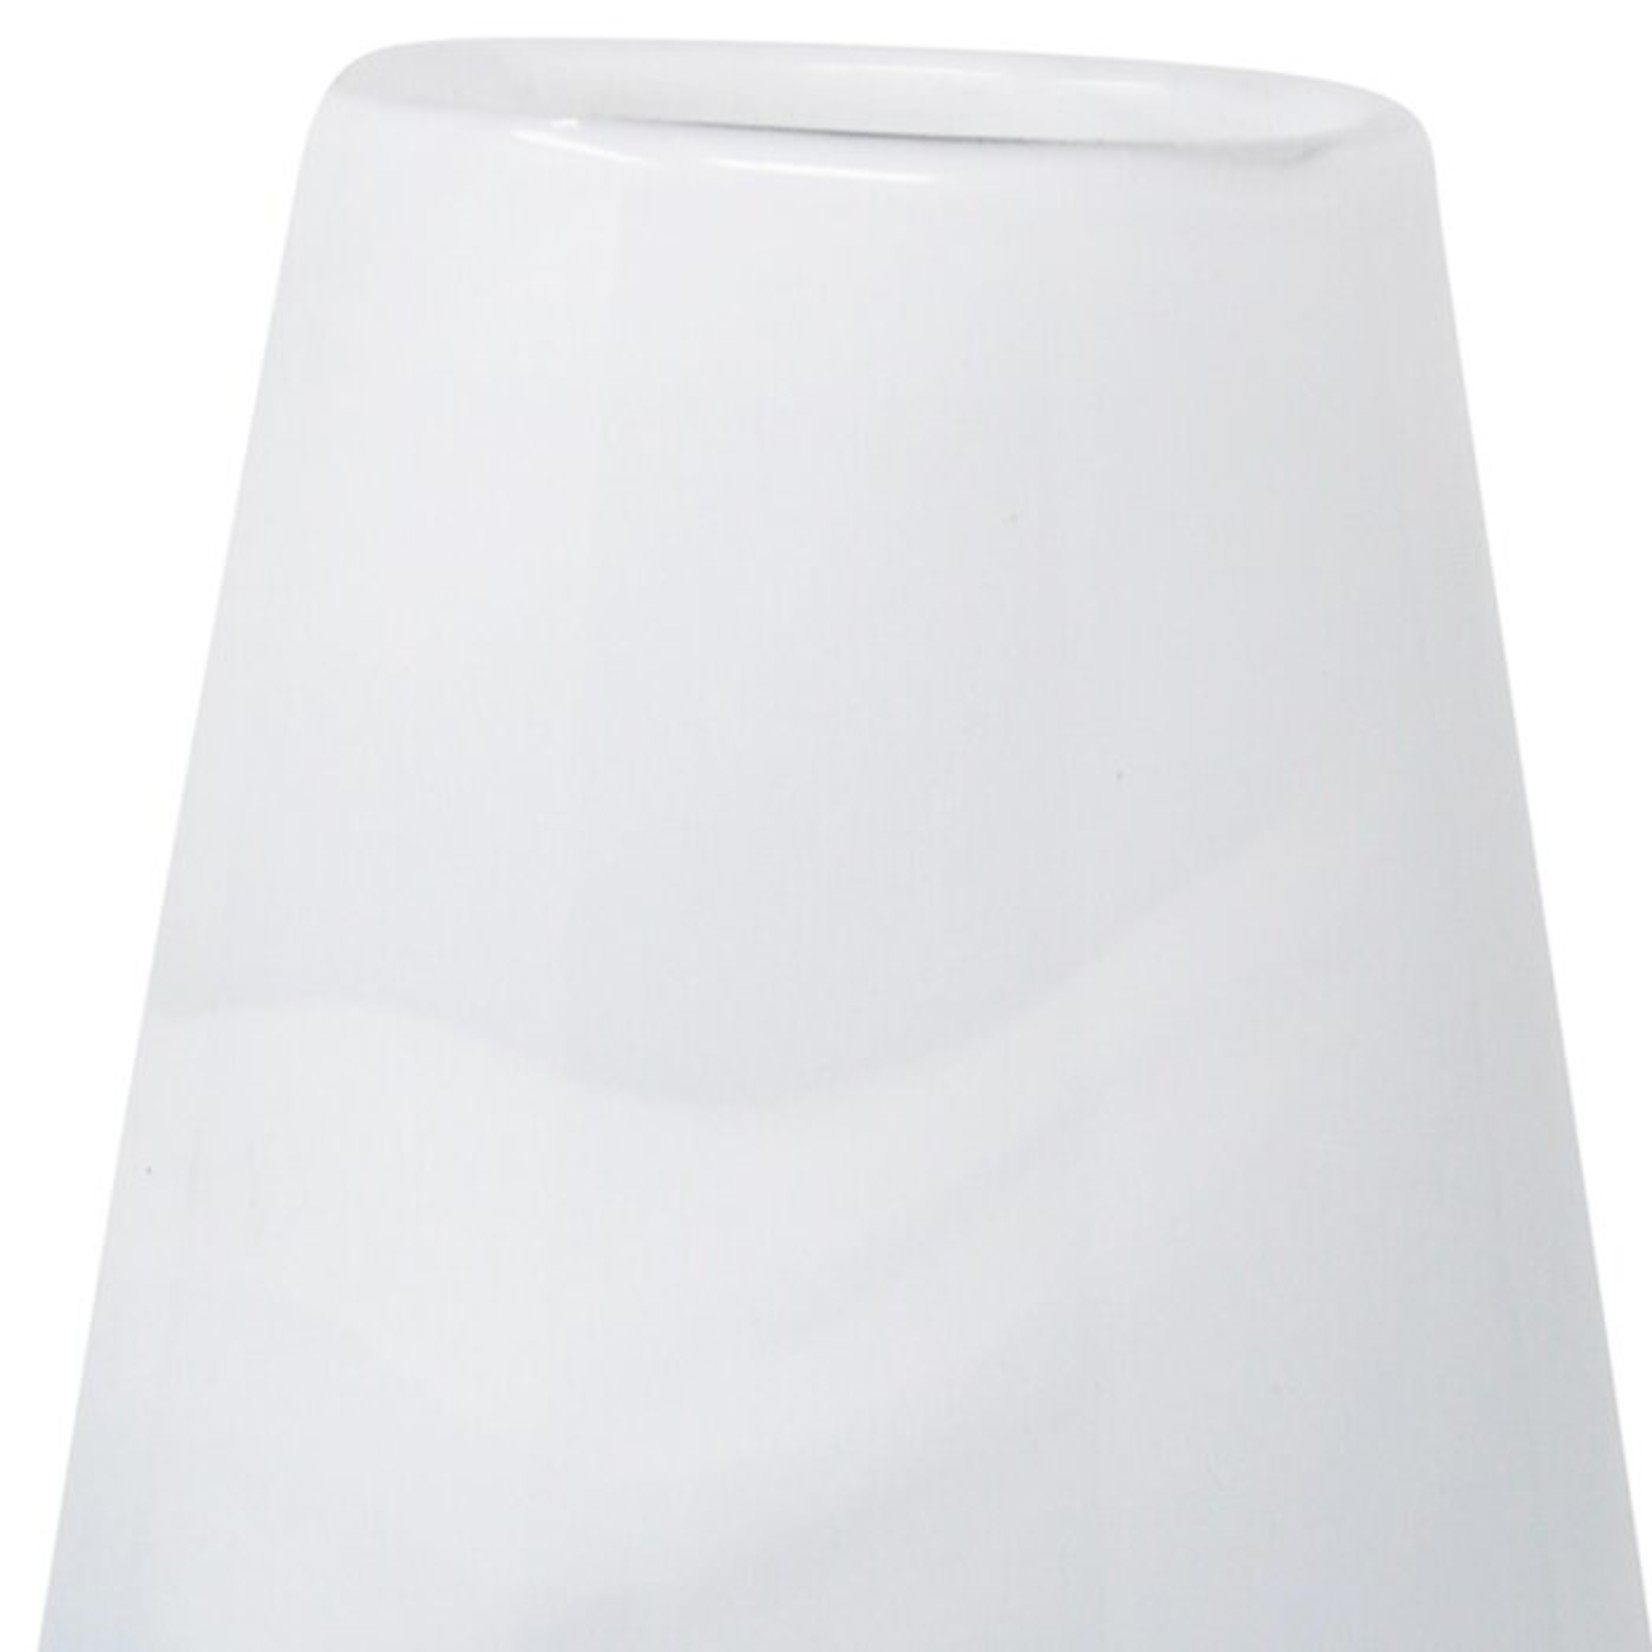 Gazit White/Blue 16.75'' Glass Table Vase